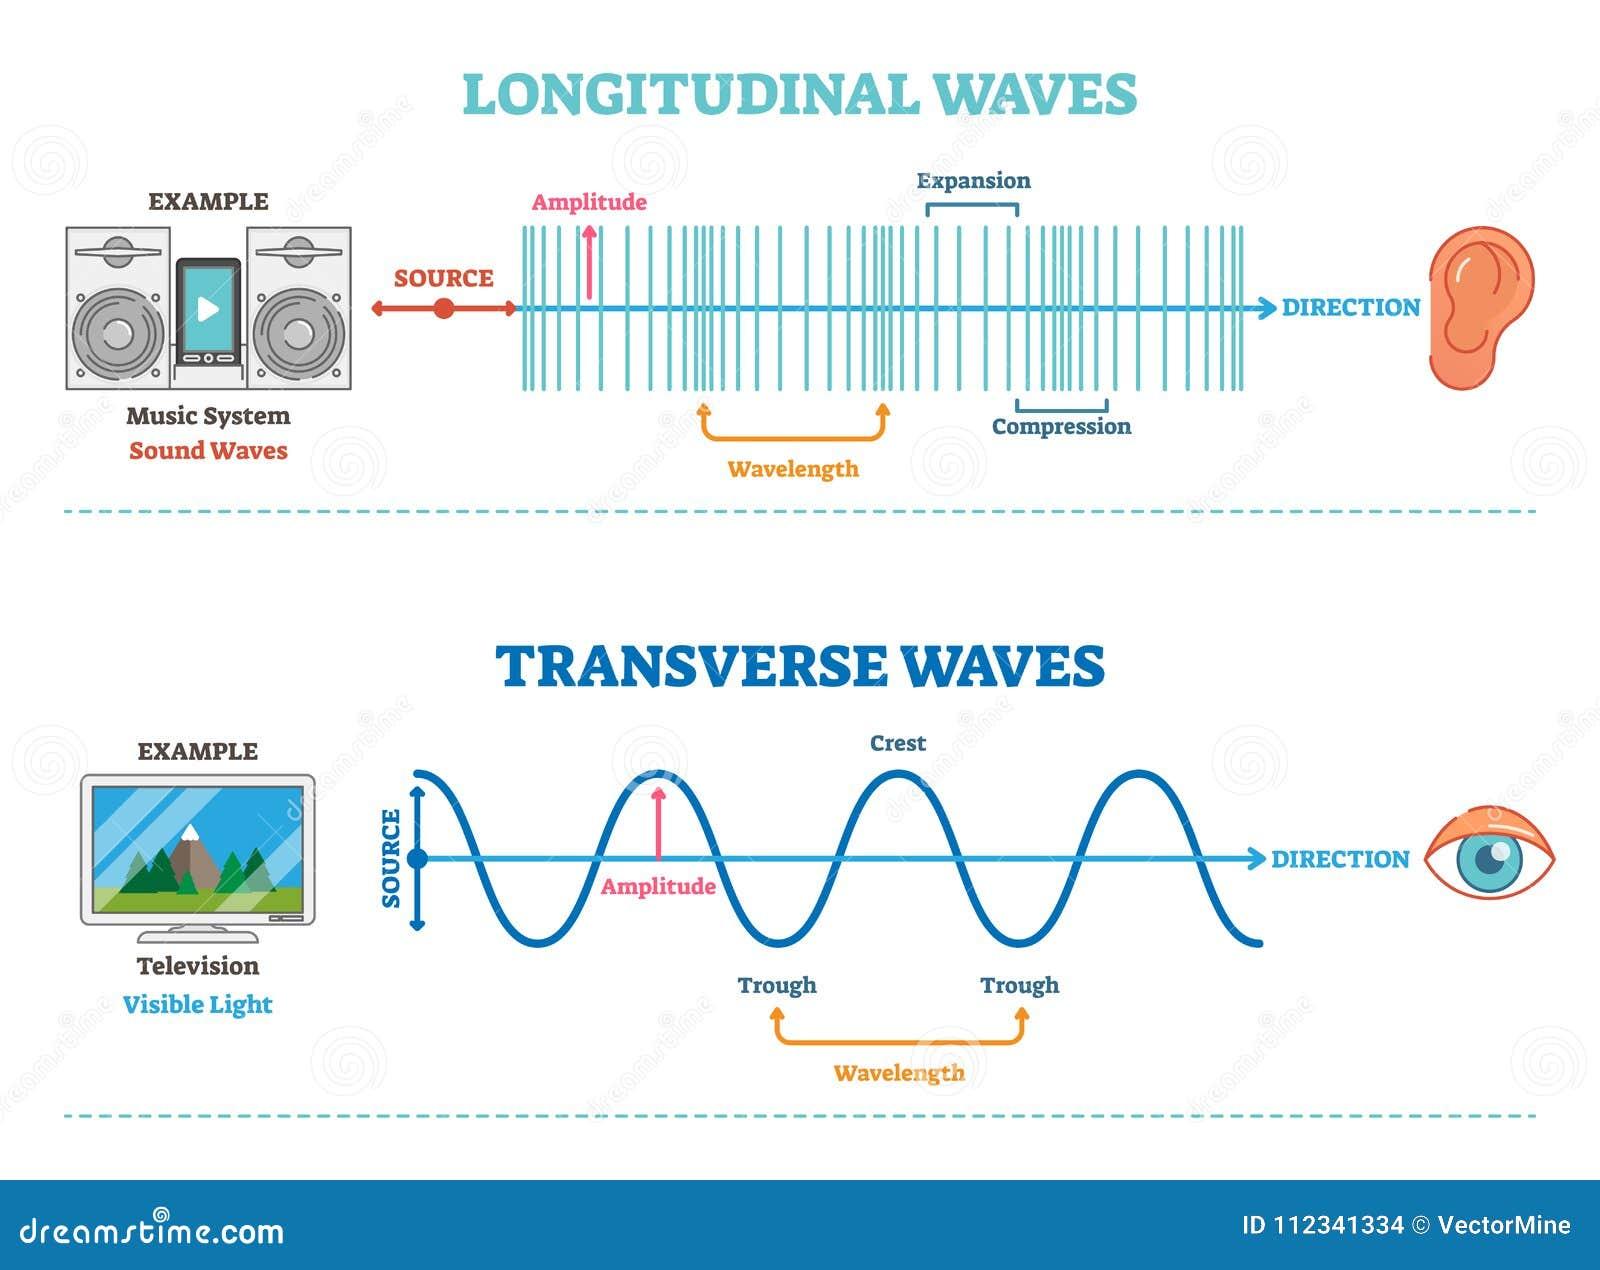 longitudinal transverse wave type vector illustration scientific diagram sonic visual perception principle structure 112341334 longitudinal and transverse wave type, vector illustration